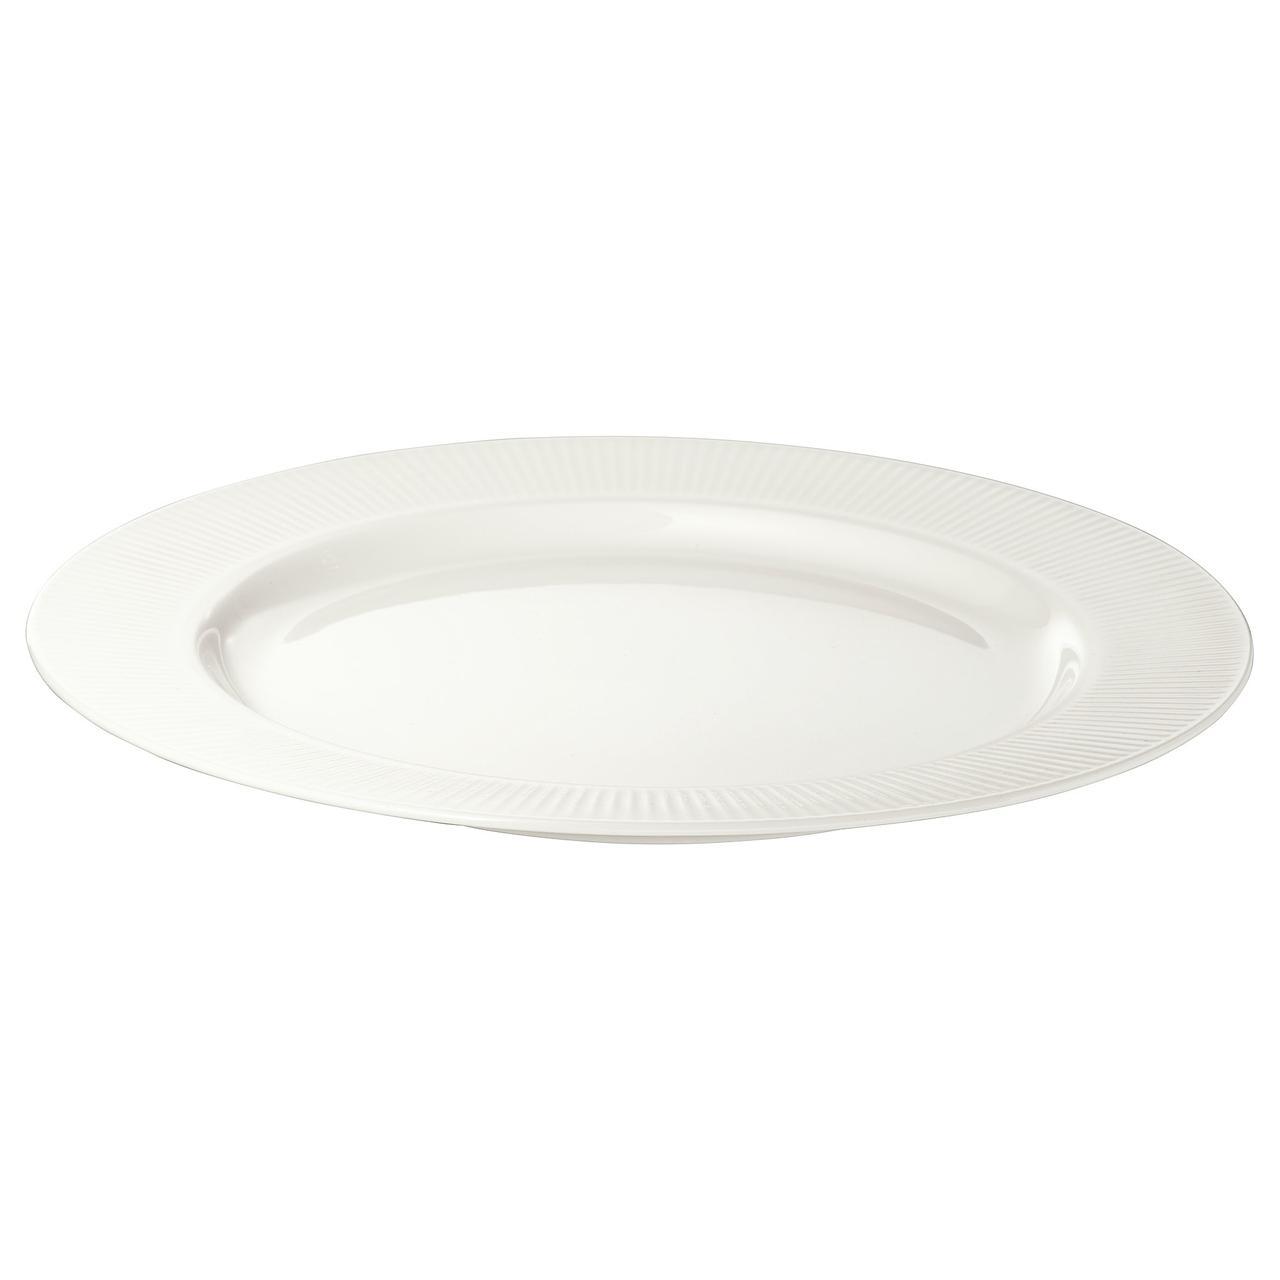 ОФАНТЛИГТ Тарелка десертная, белый